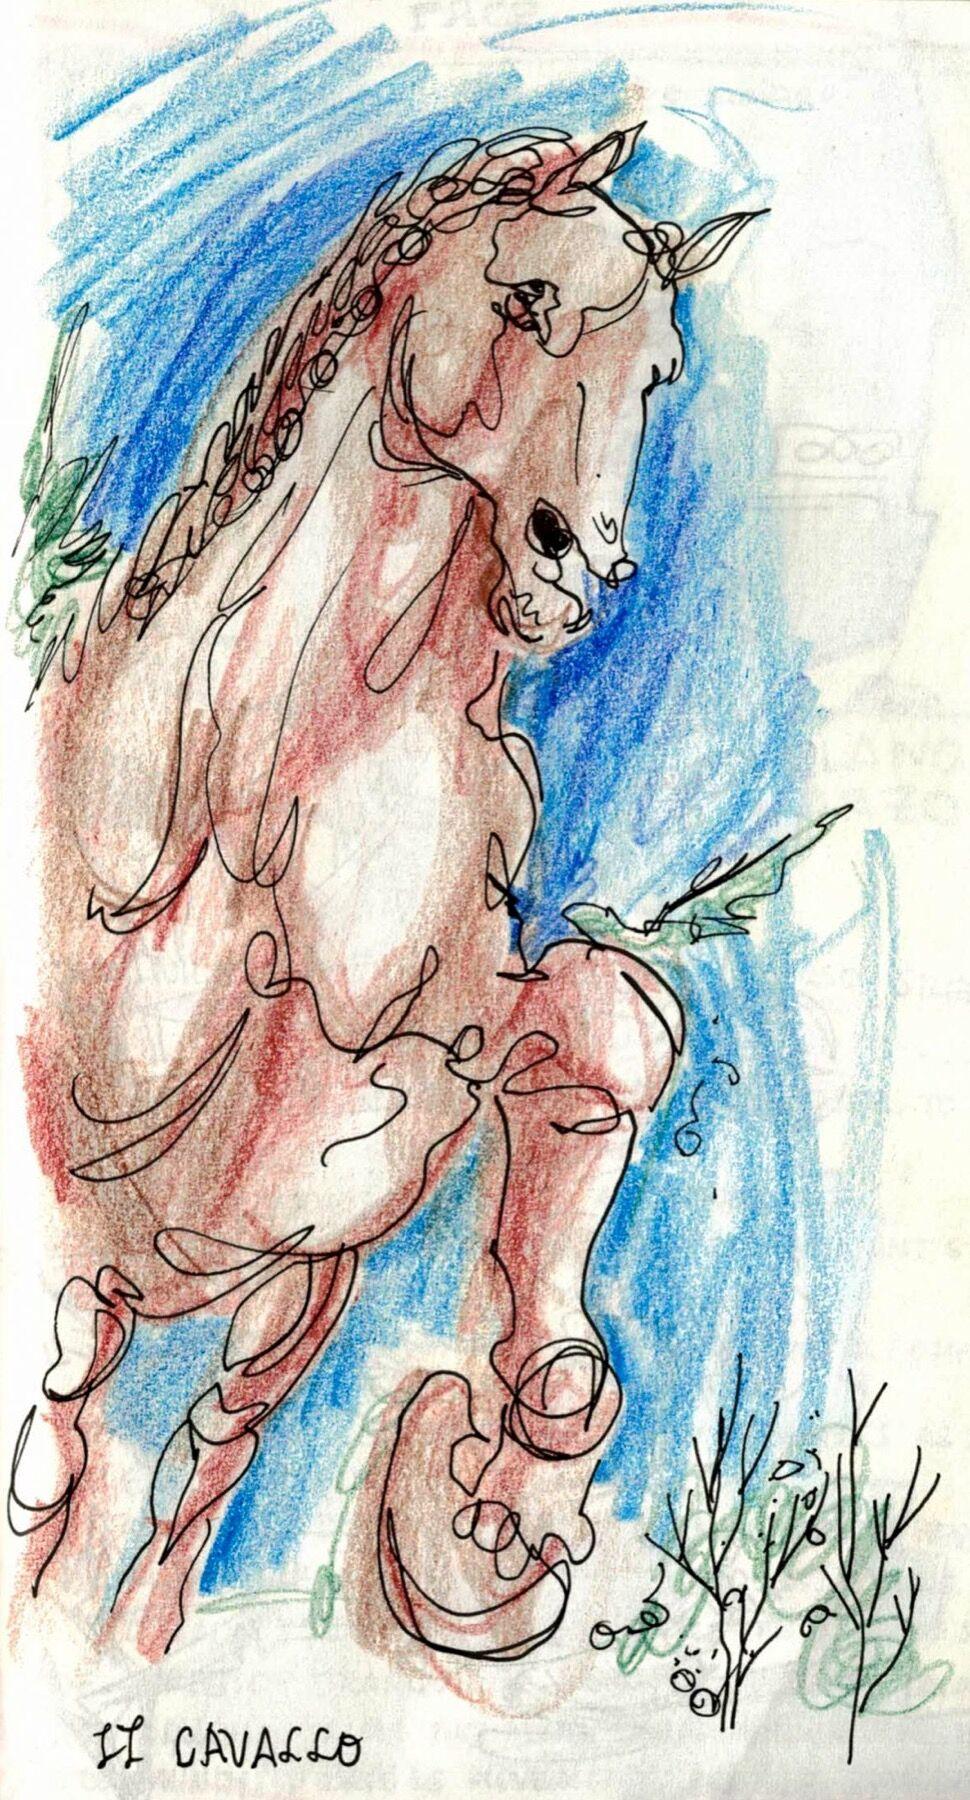 Il Cavallo. Sketch by Nikki Martinez. Courtesy of the artist.